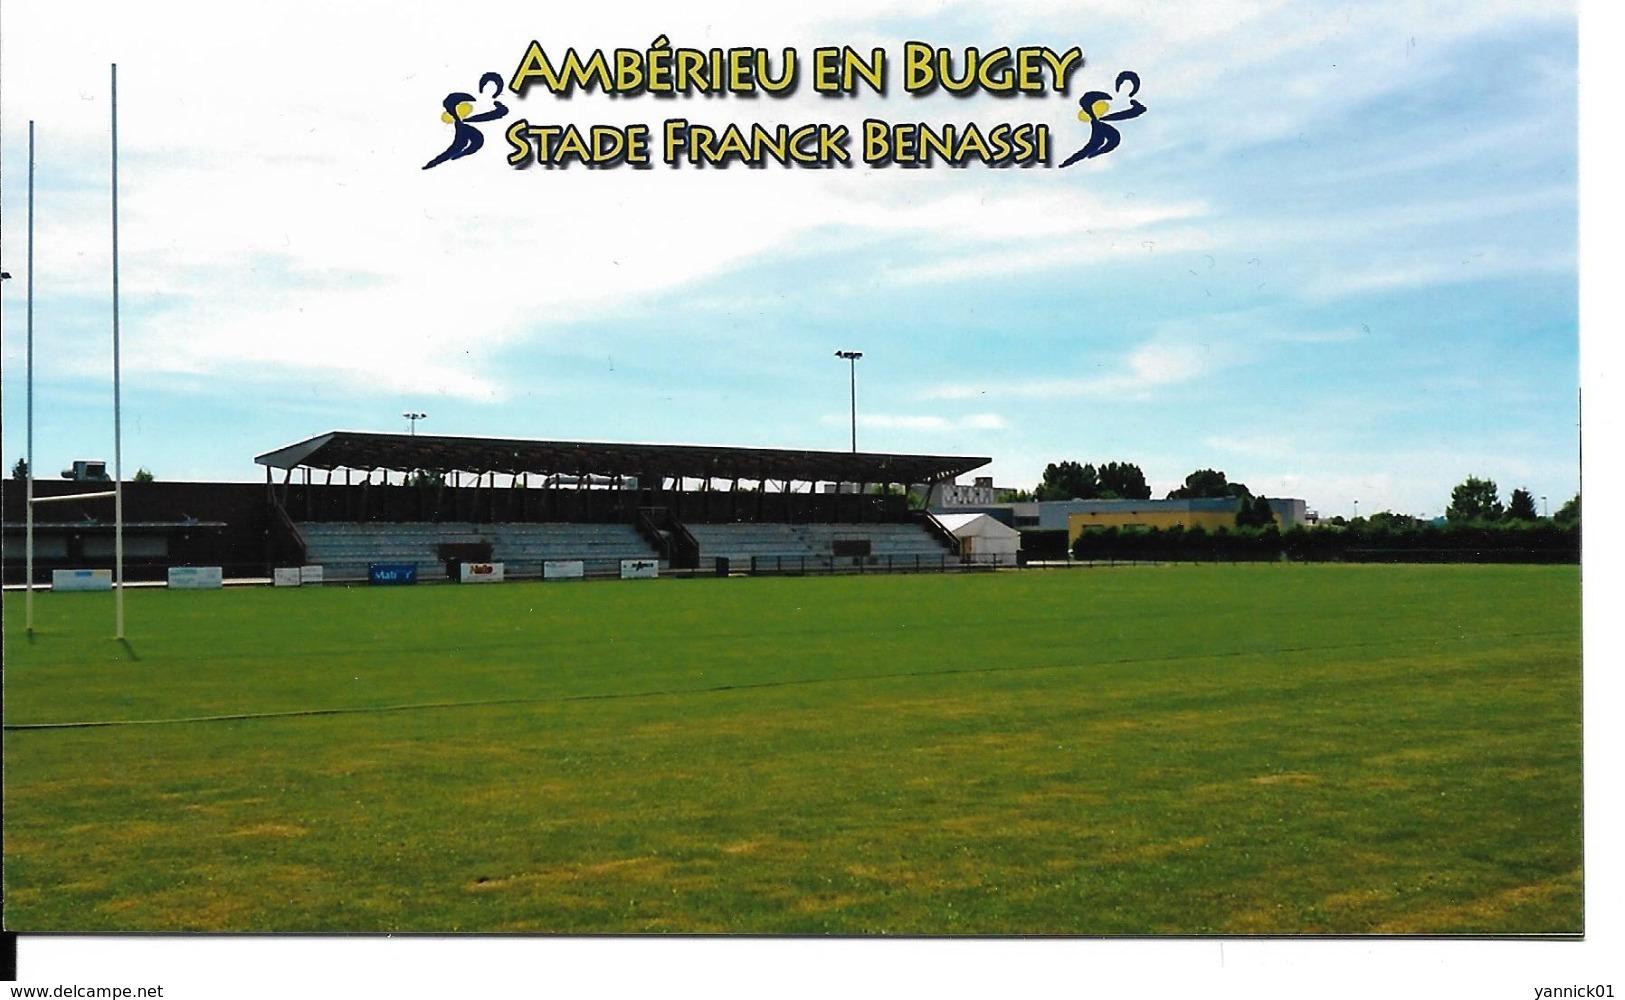 STADE RUGBY FOOTBALL FRANCK BENASSI AMBERIEU EN BUGEY  ESTADIO - STADIUM STADIO - Rugby